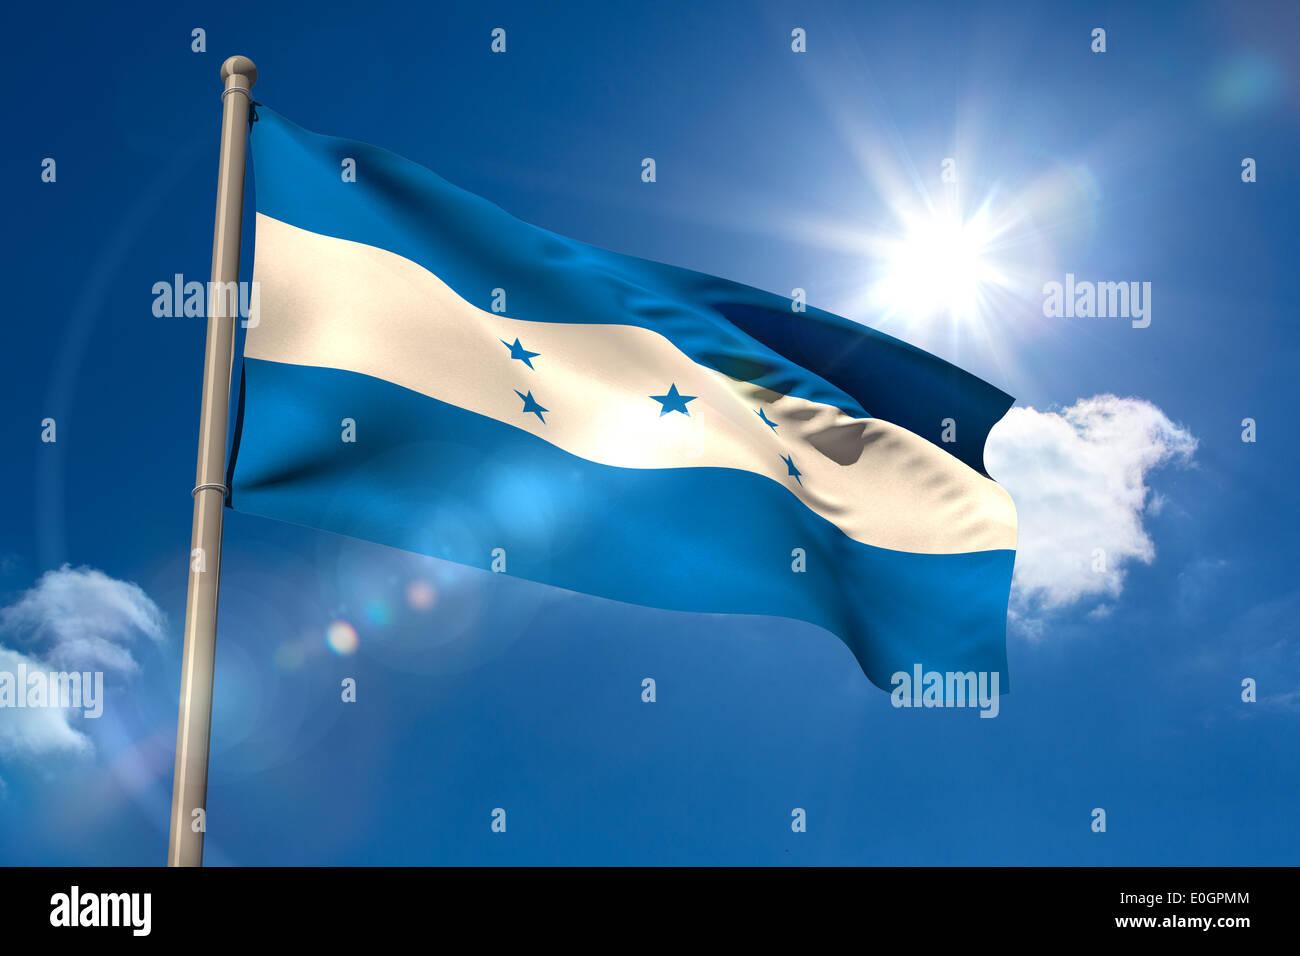 Honduras national flag on flagpole - Stock Image